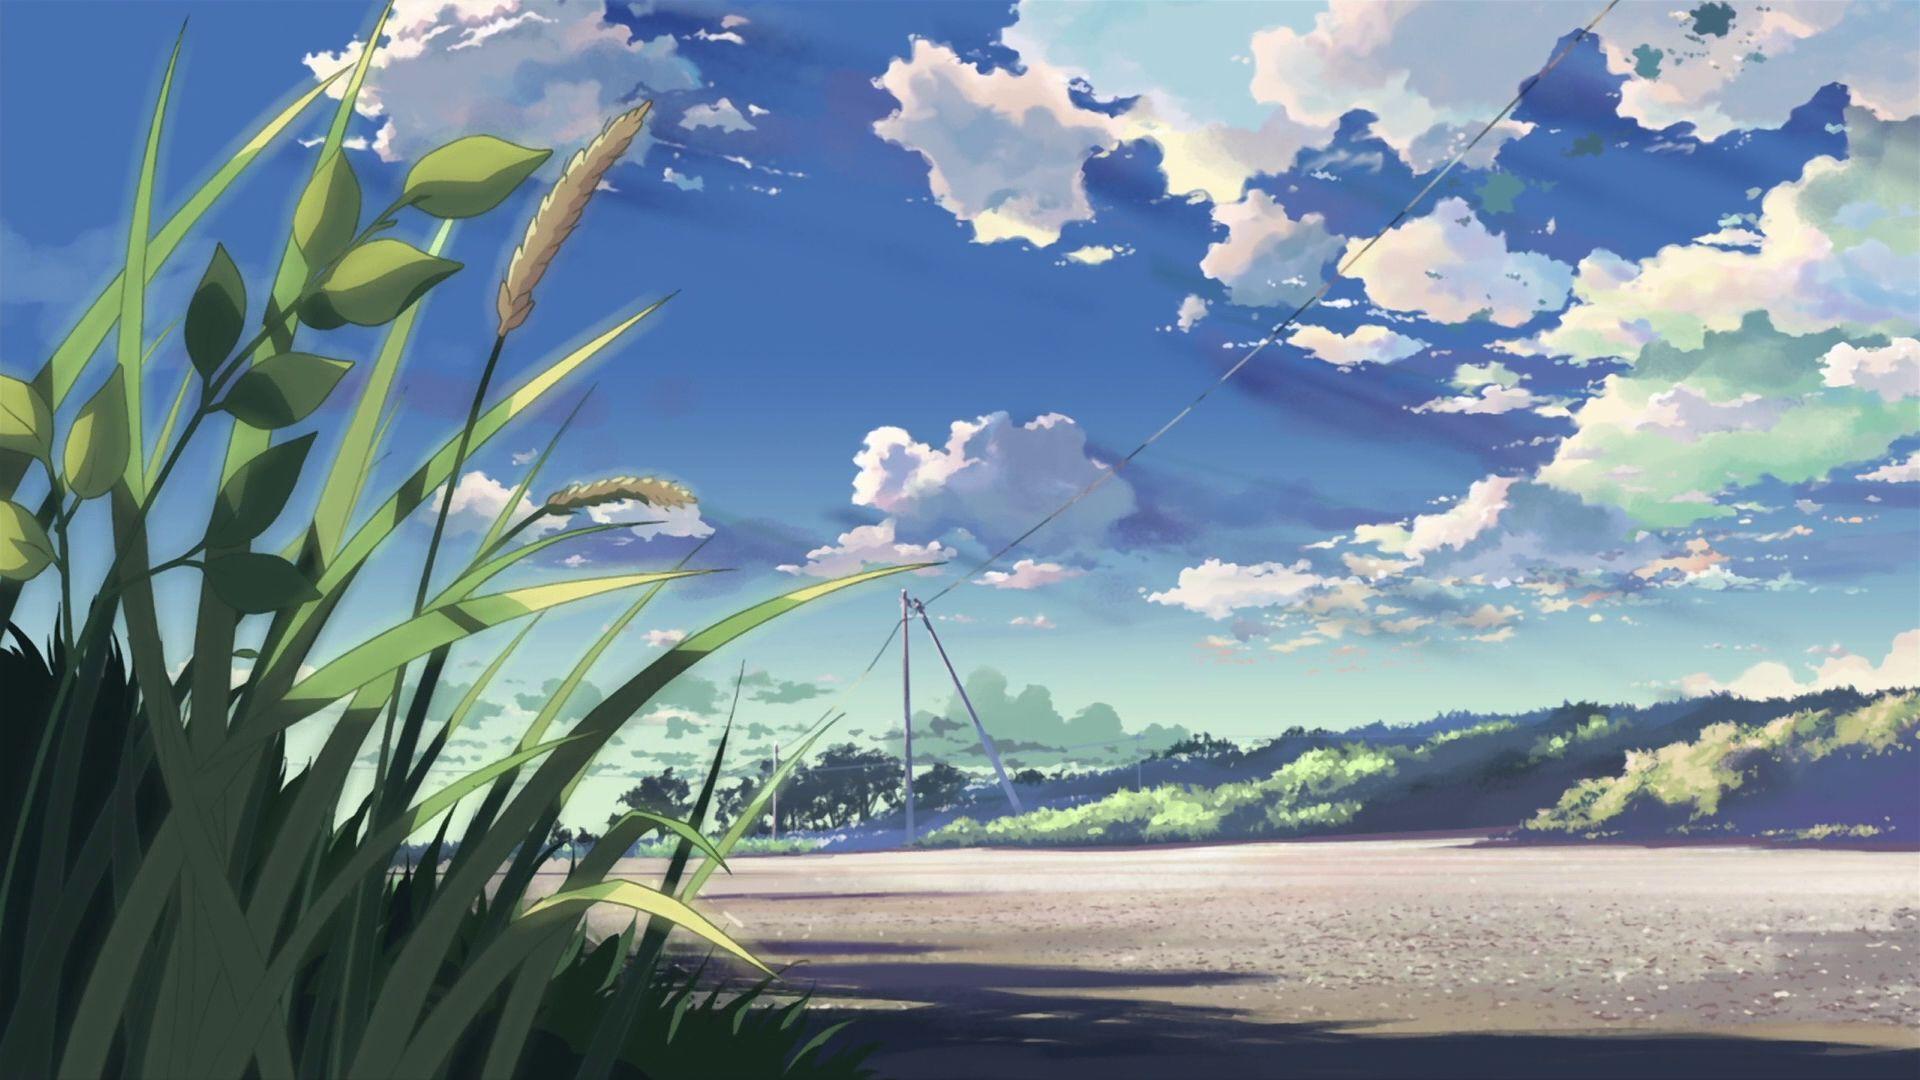 wallpaper anime scenery